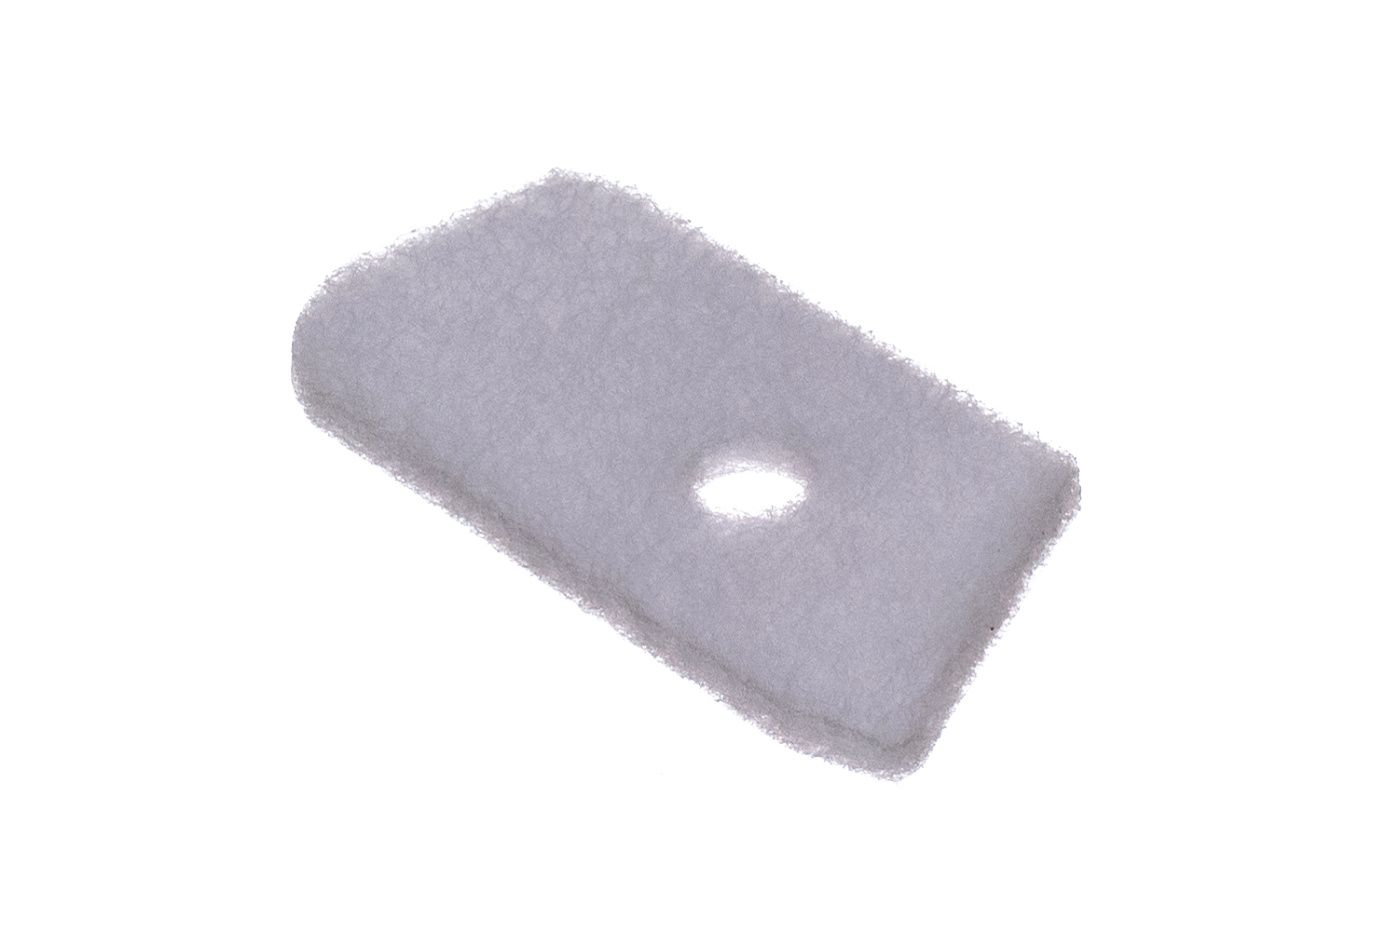 Vzduchový filtr Husqvarna 125 128R